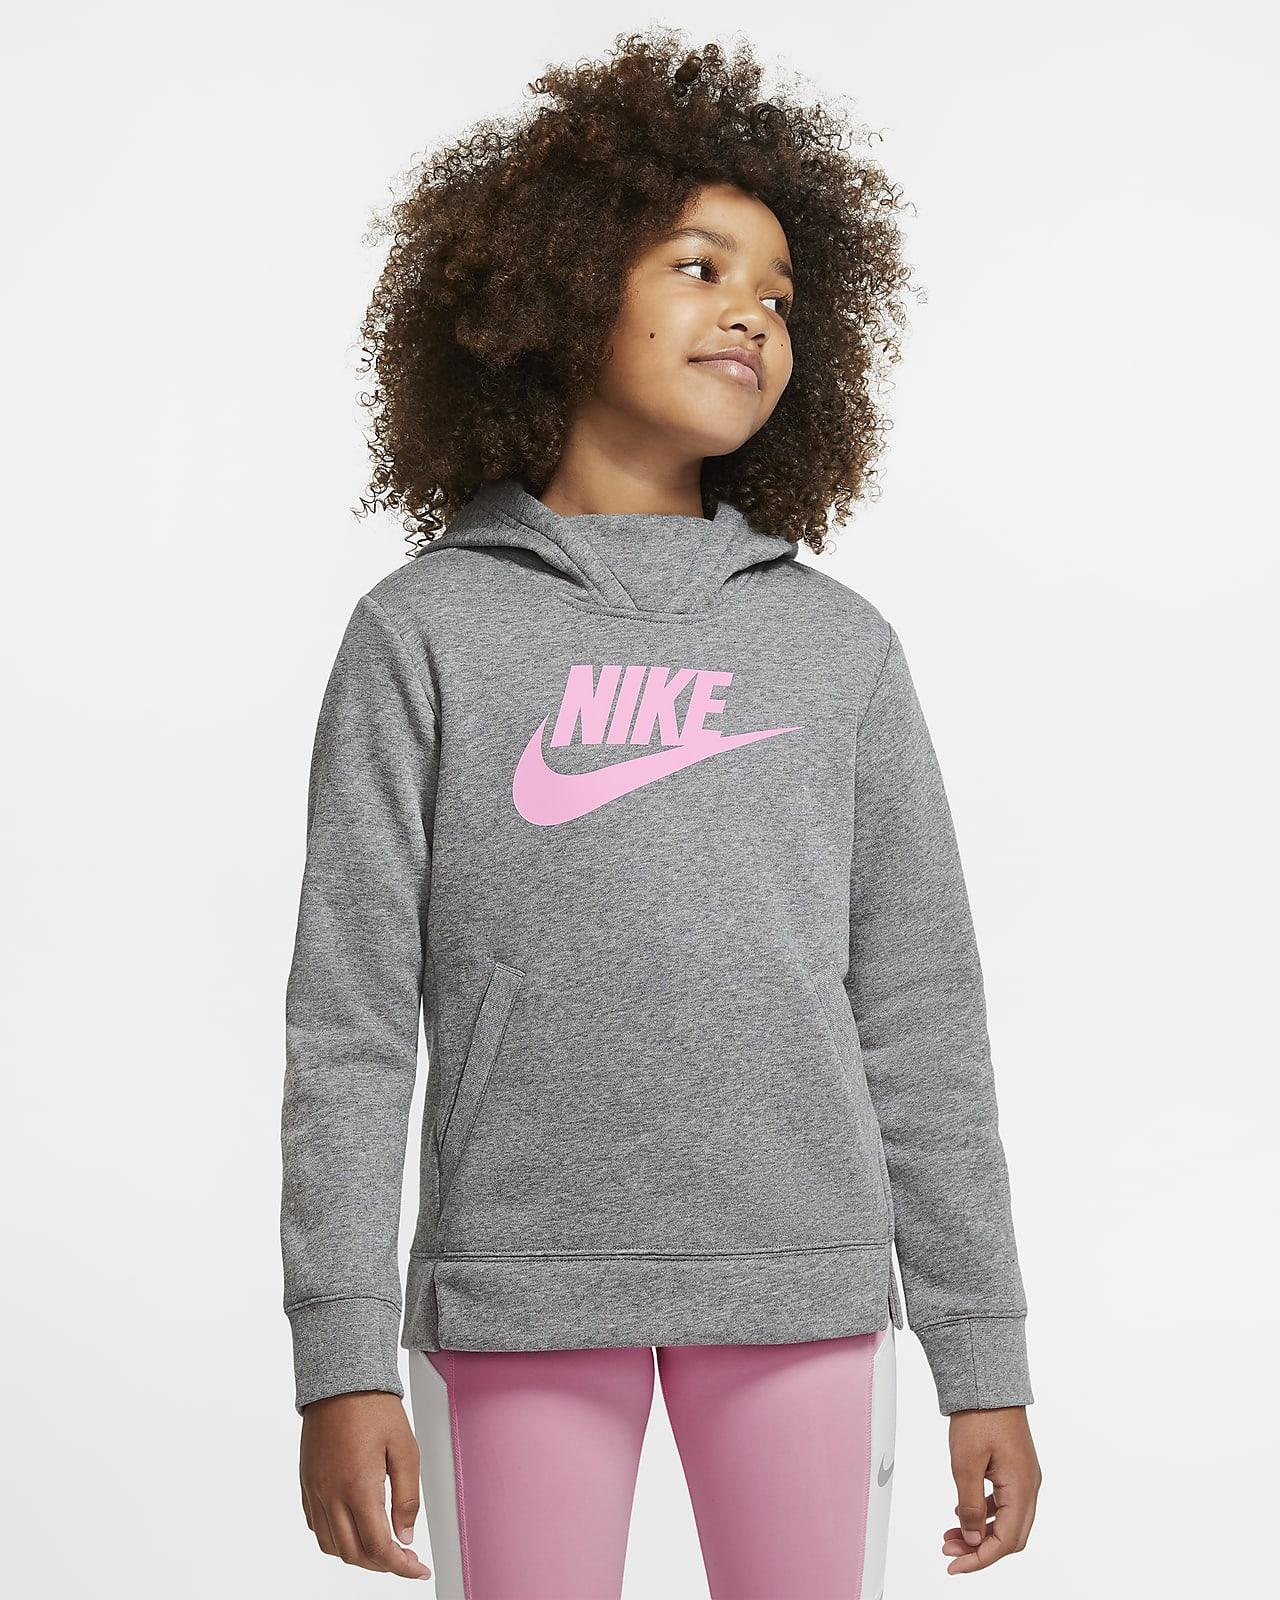 Hoodie pullover Nike Sportswear para rapariga